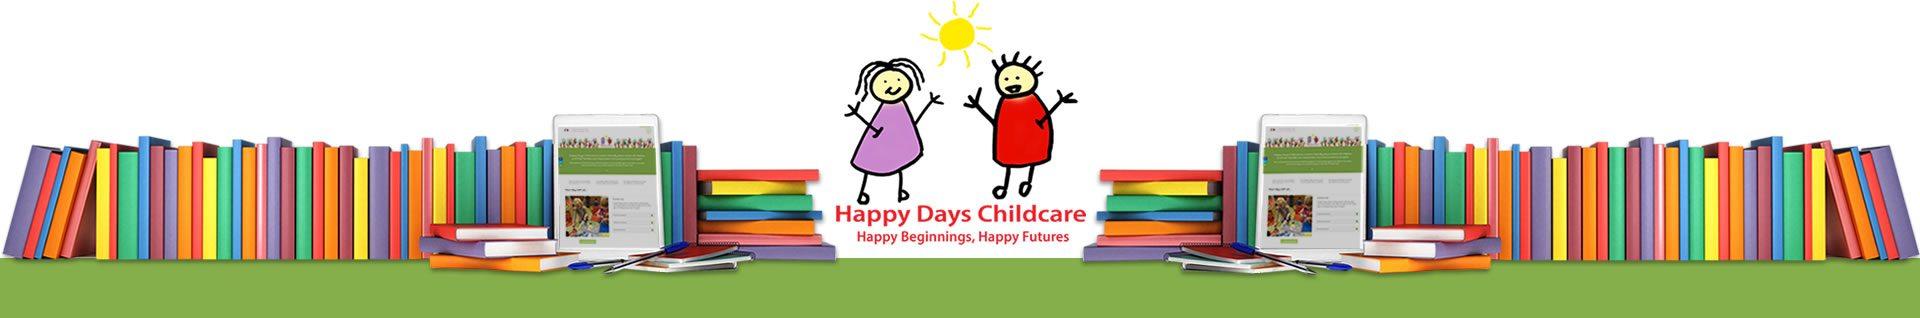 Happy Days Childcare documents